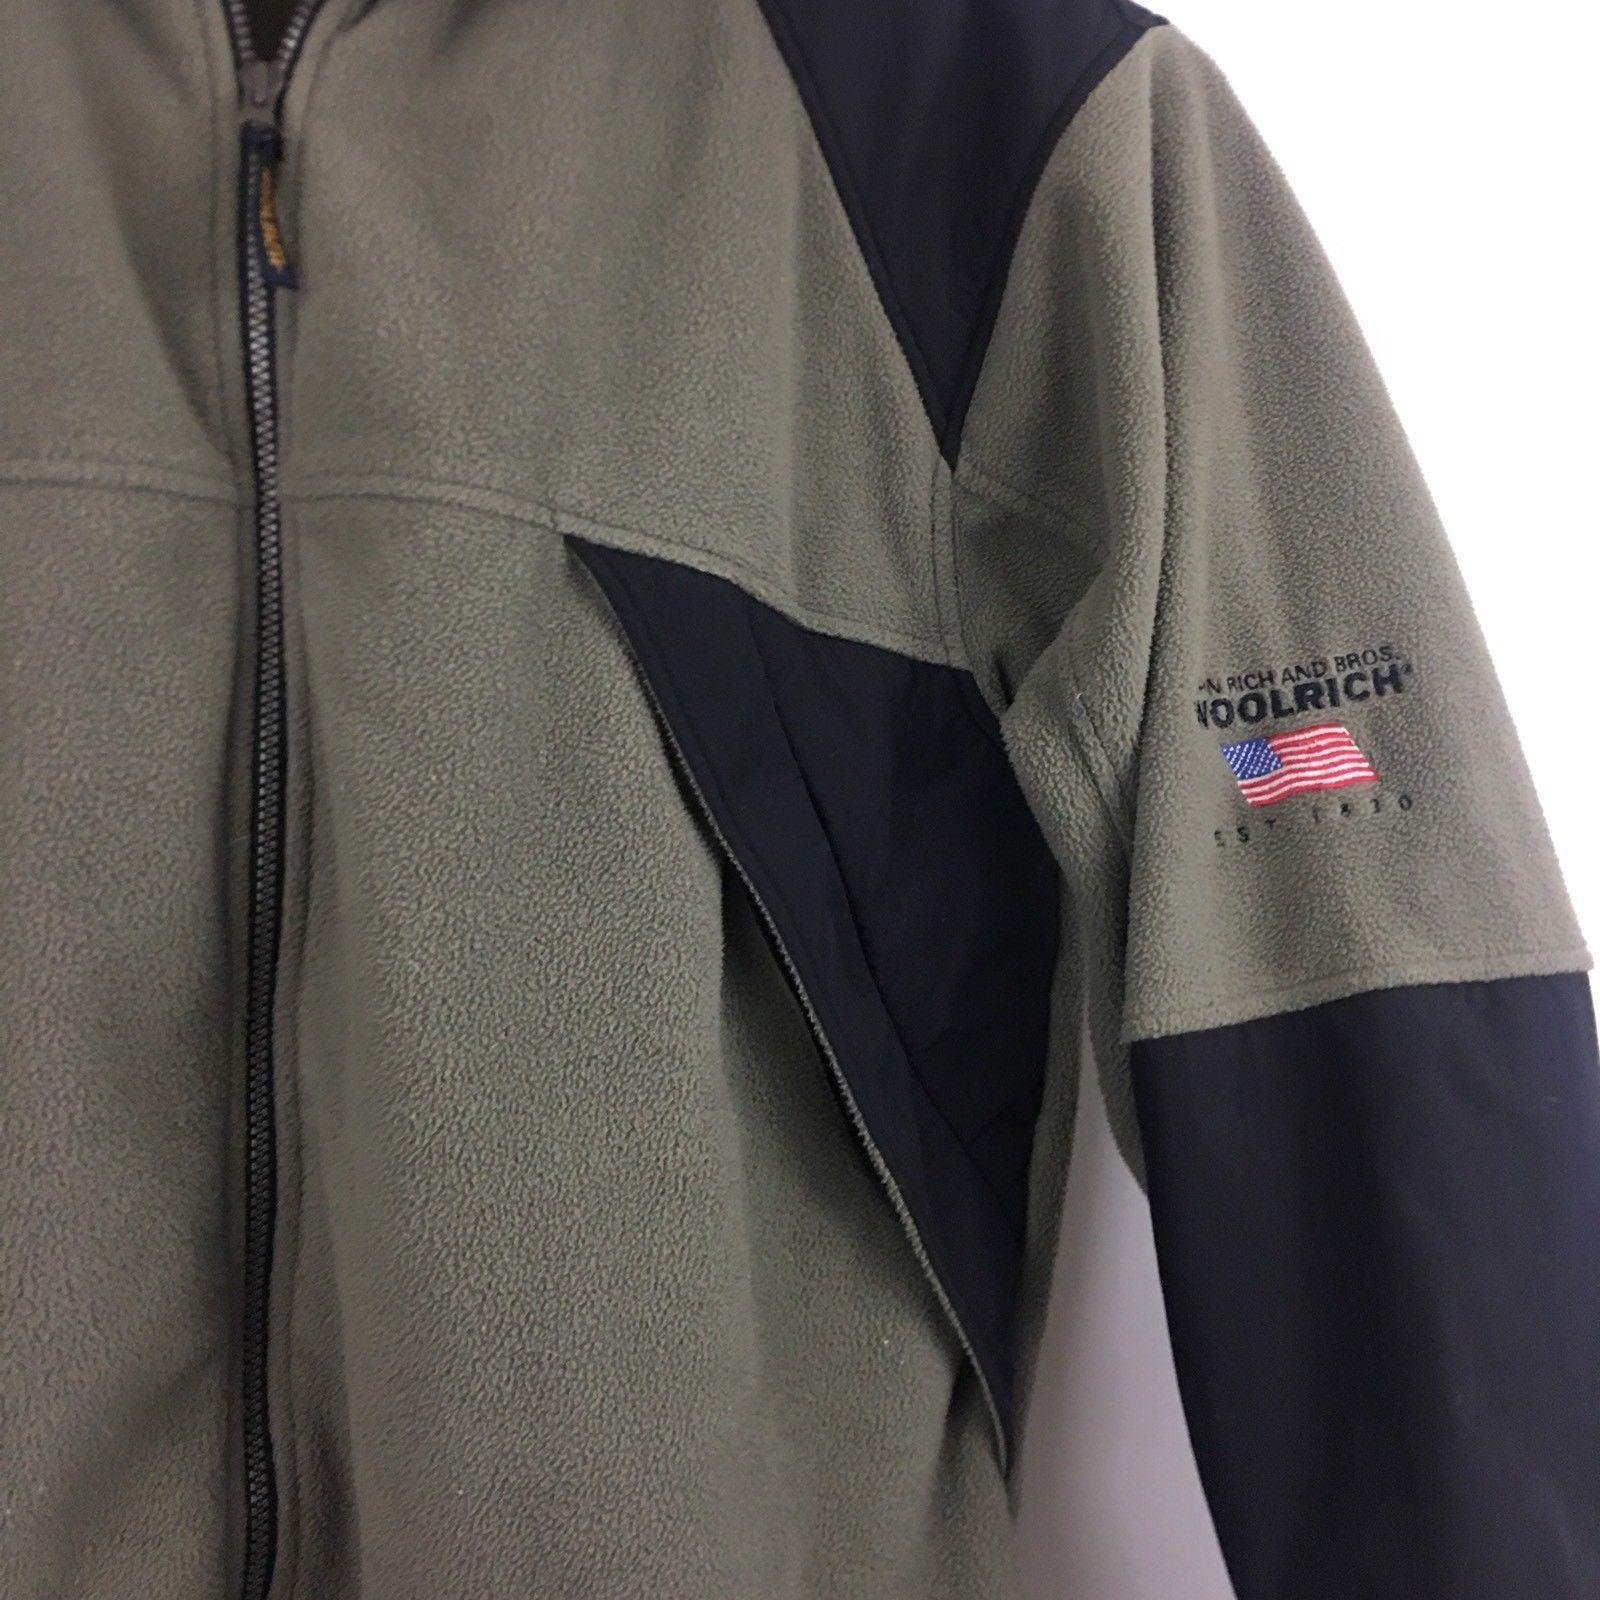 Woolrich Mens  Zip Up Fleece Jacket Sz L Large Zip Up Pockets B209 image 3